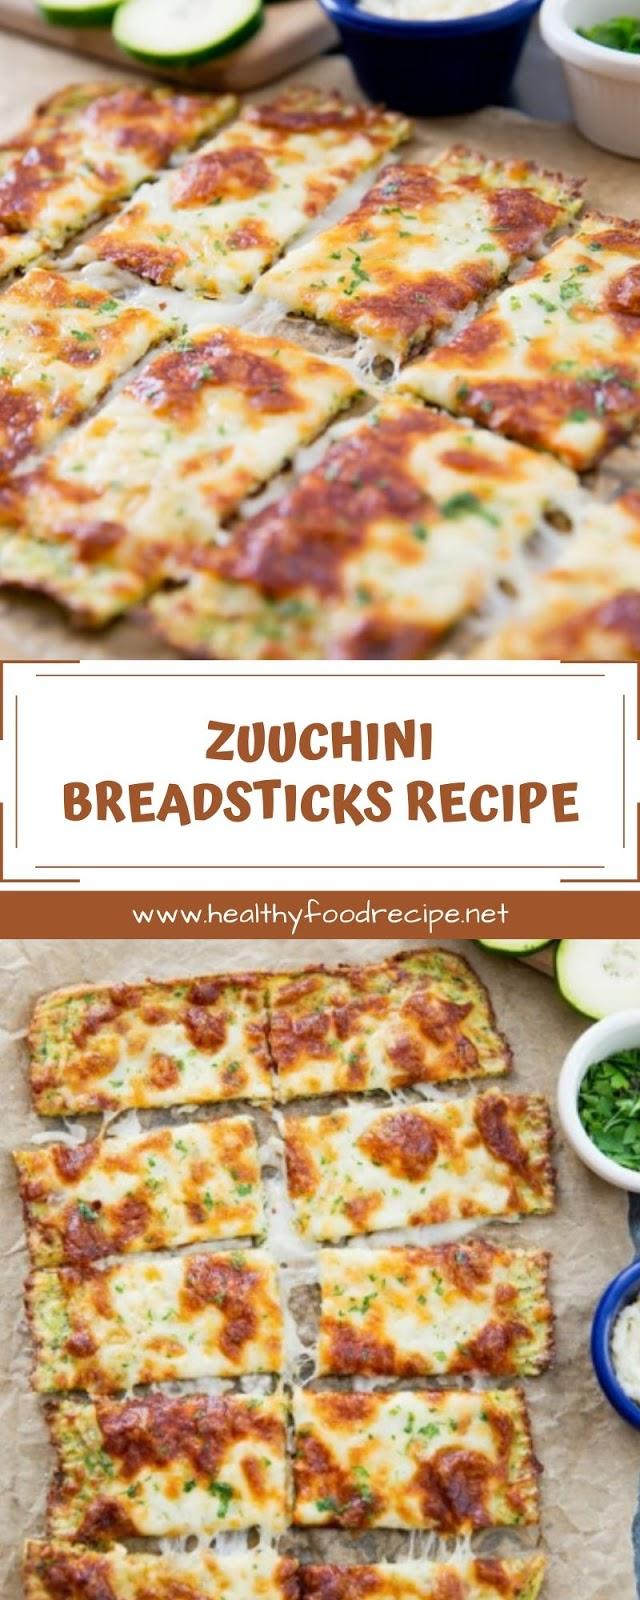 ZUUCHINI BREADSTICKS RECIPE